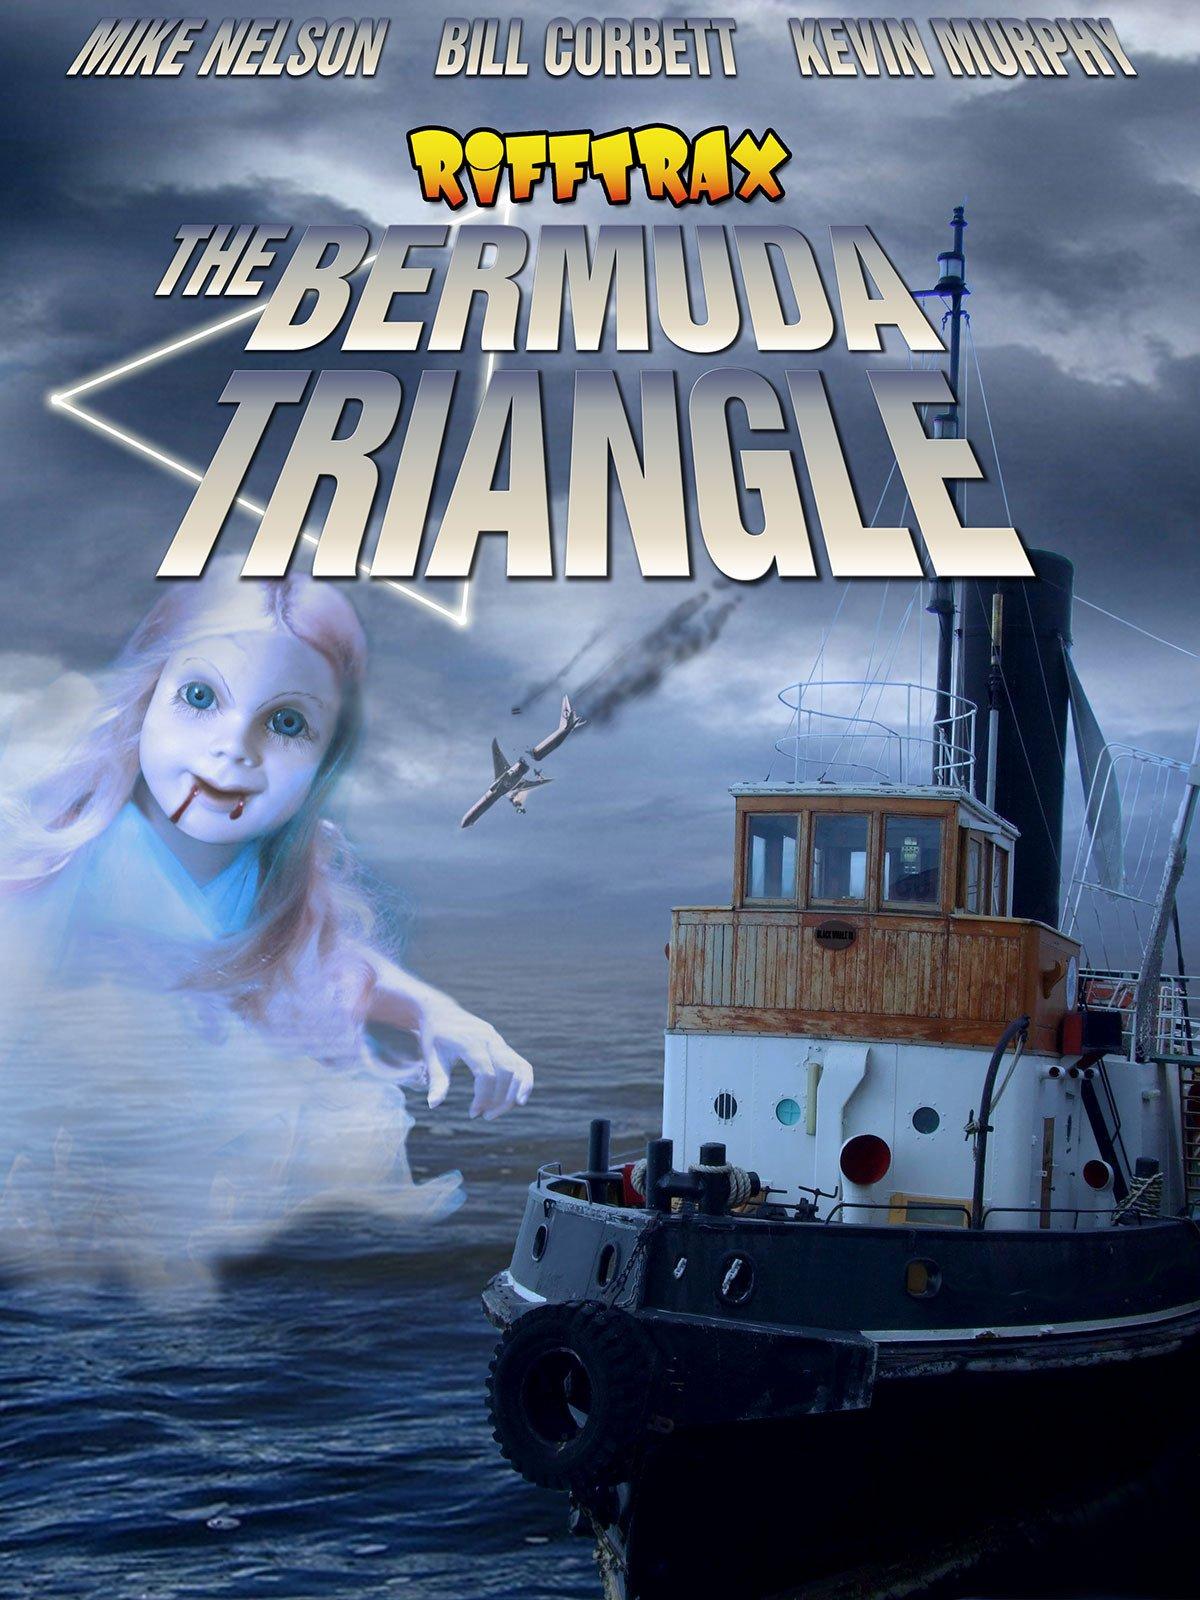 RiffTrax: The Bermuda Triangle